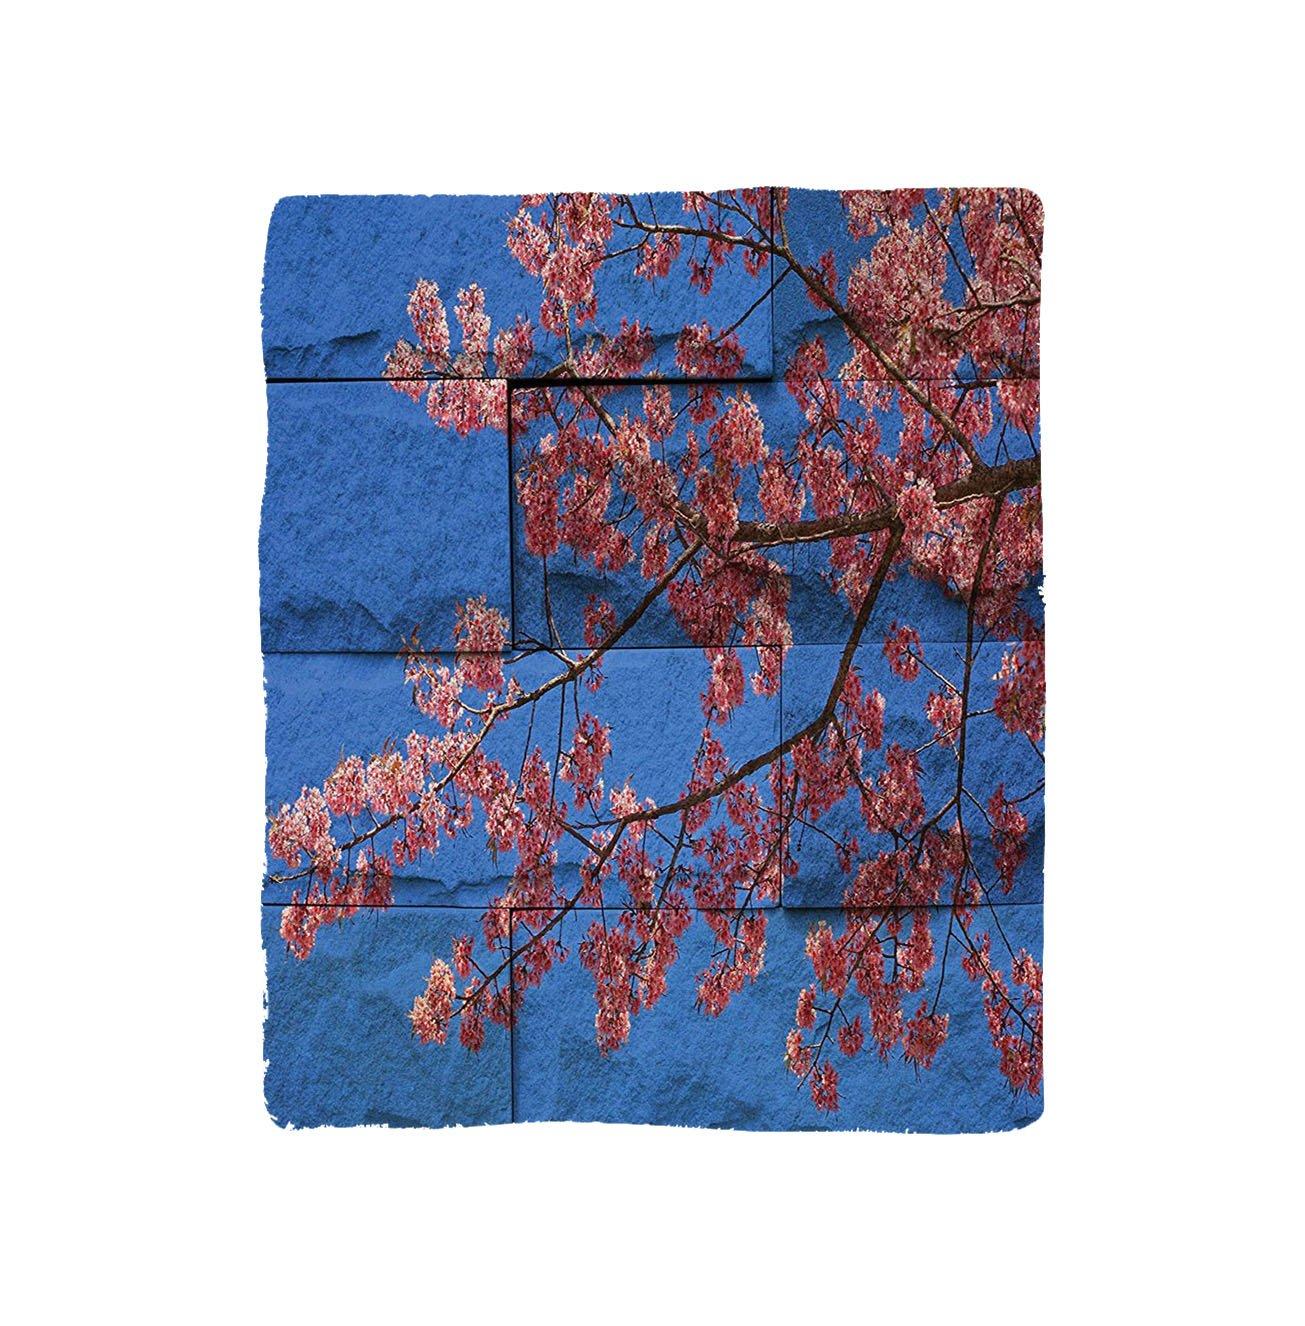 VROSELV Custom Blanket Rustic Home Thai Sakura Blossom Mural Branch with Flowers Spring Floral Beauty Print Bedroom Living Room Dorm Pink Blue